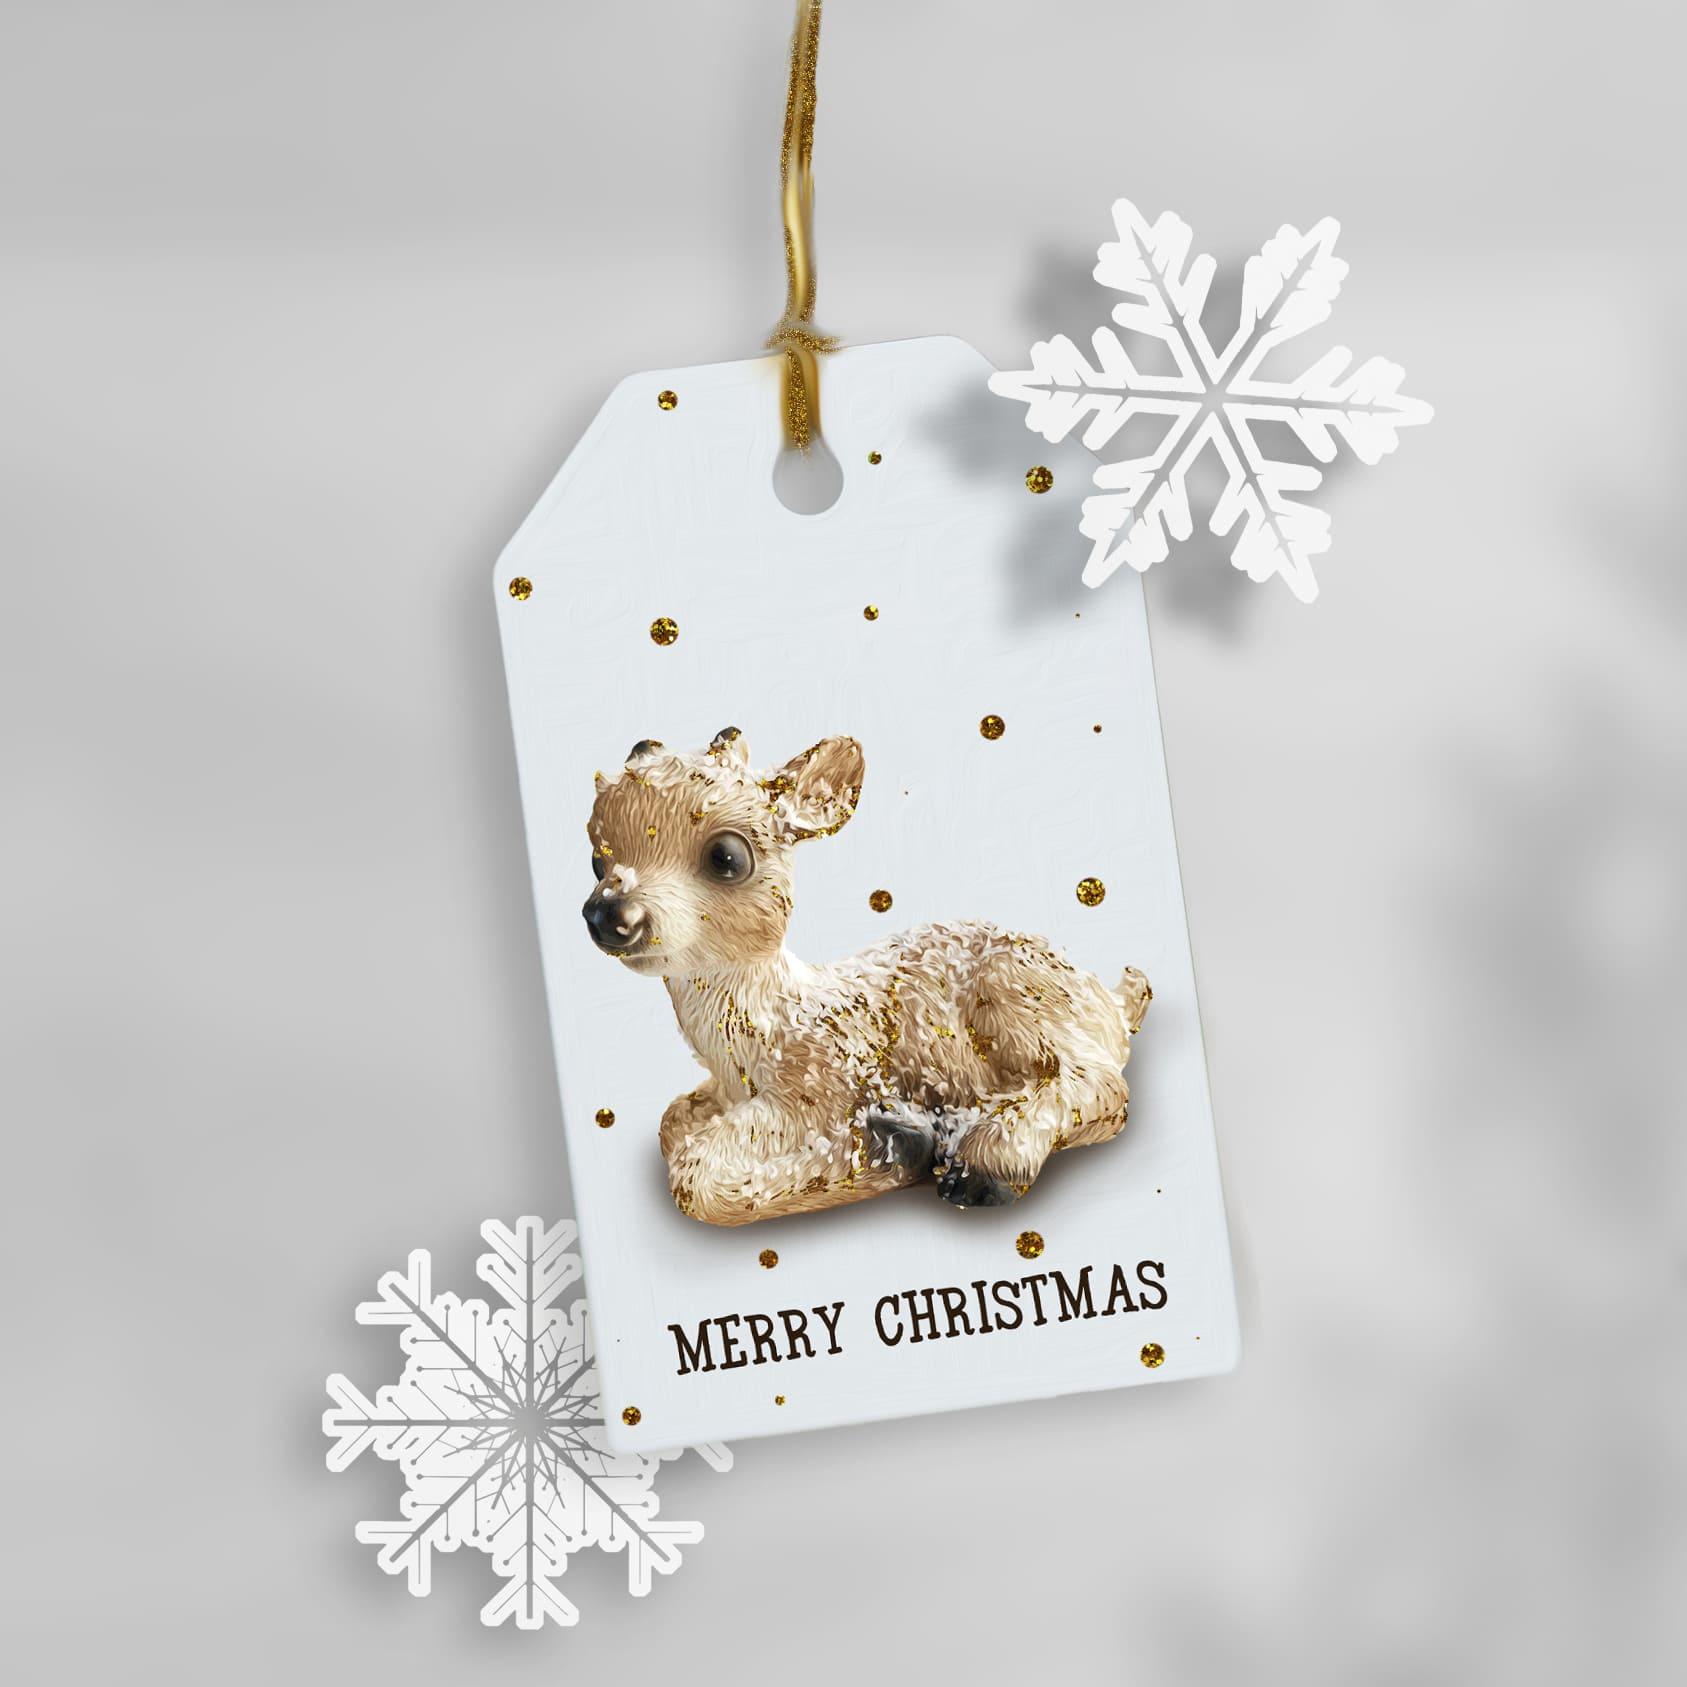 496 Christmas Illustrations: Christmas Vectors Bundle SVG, EPS, AI - c